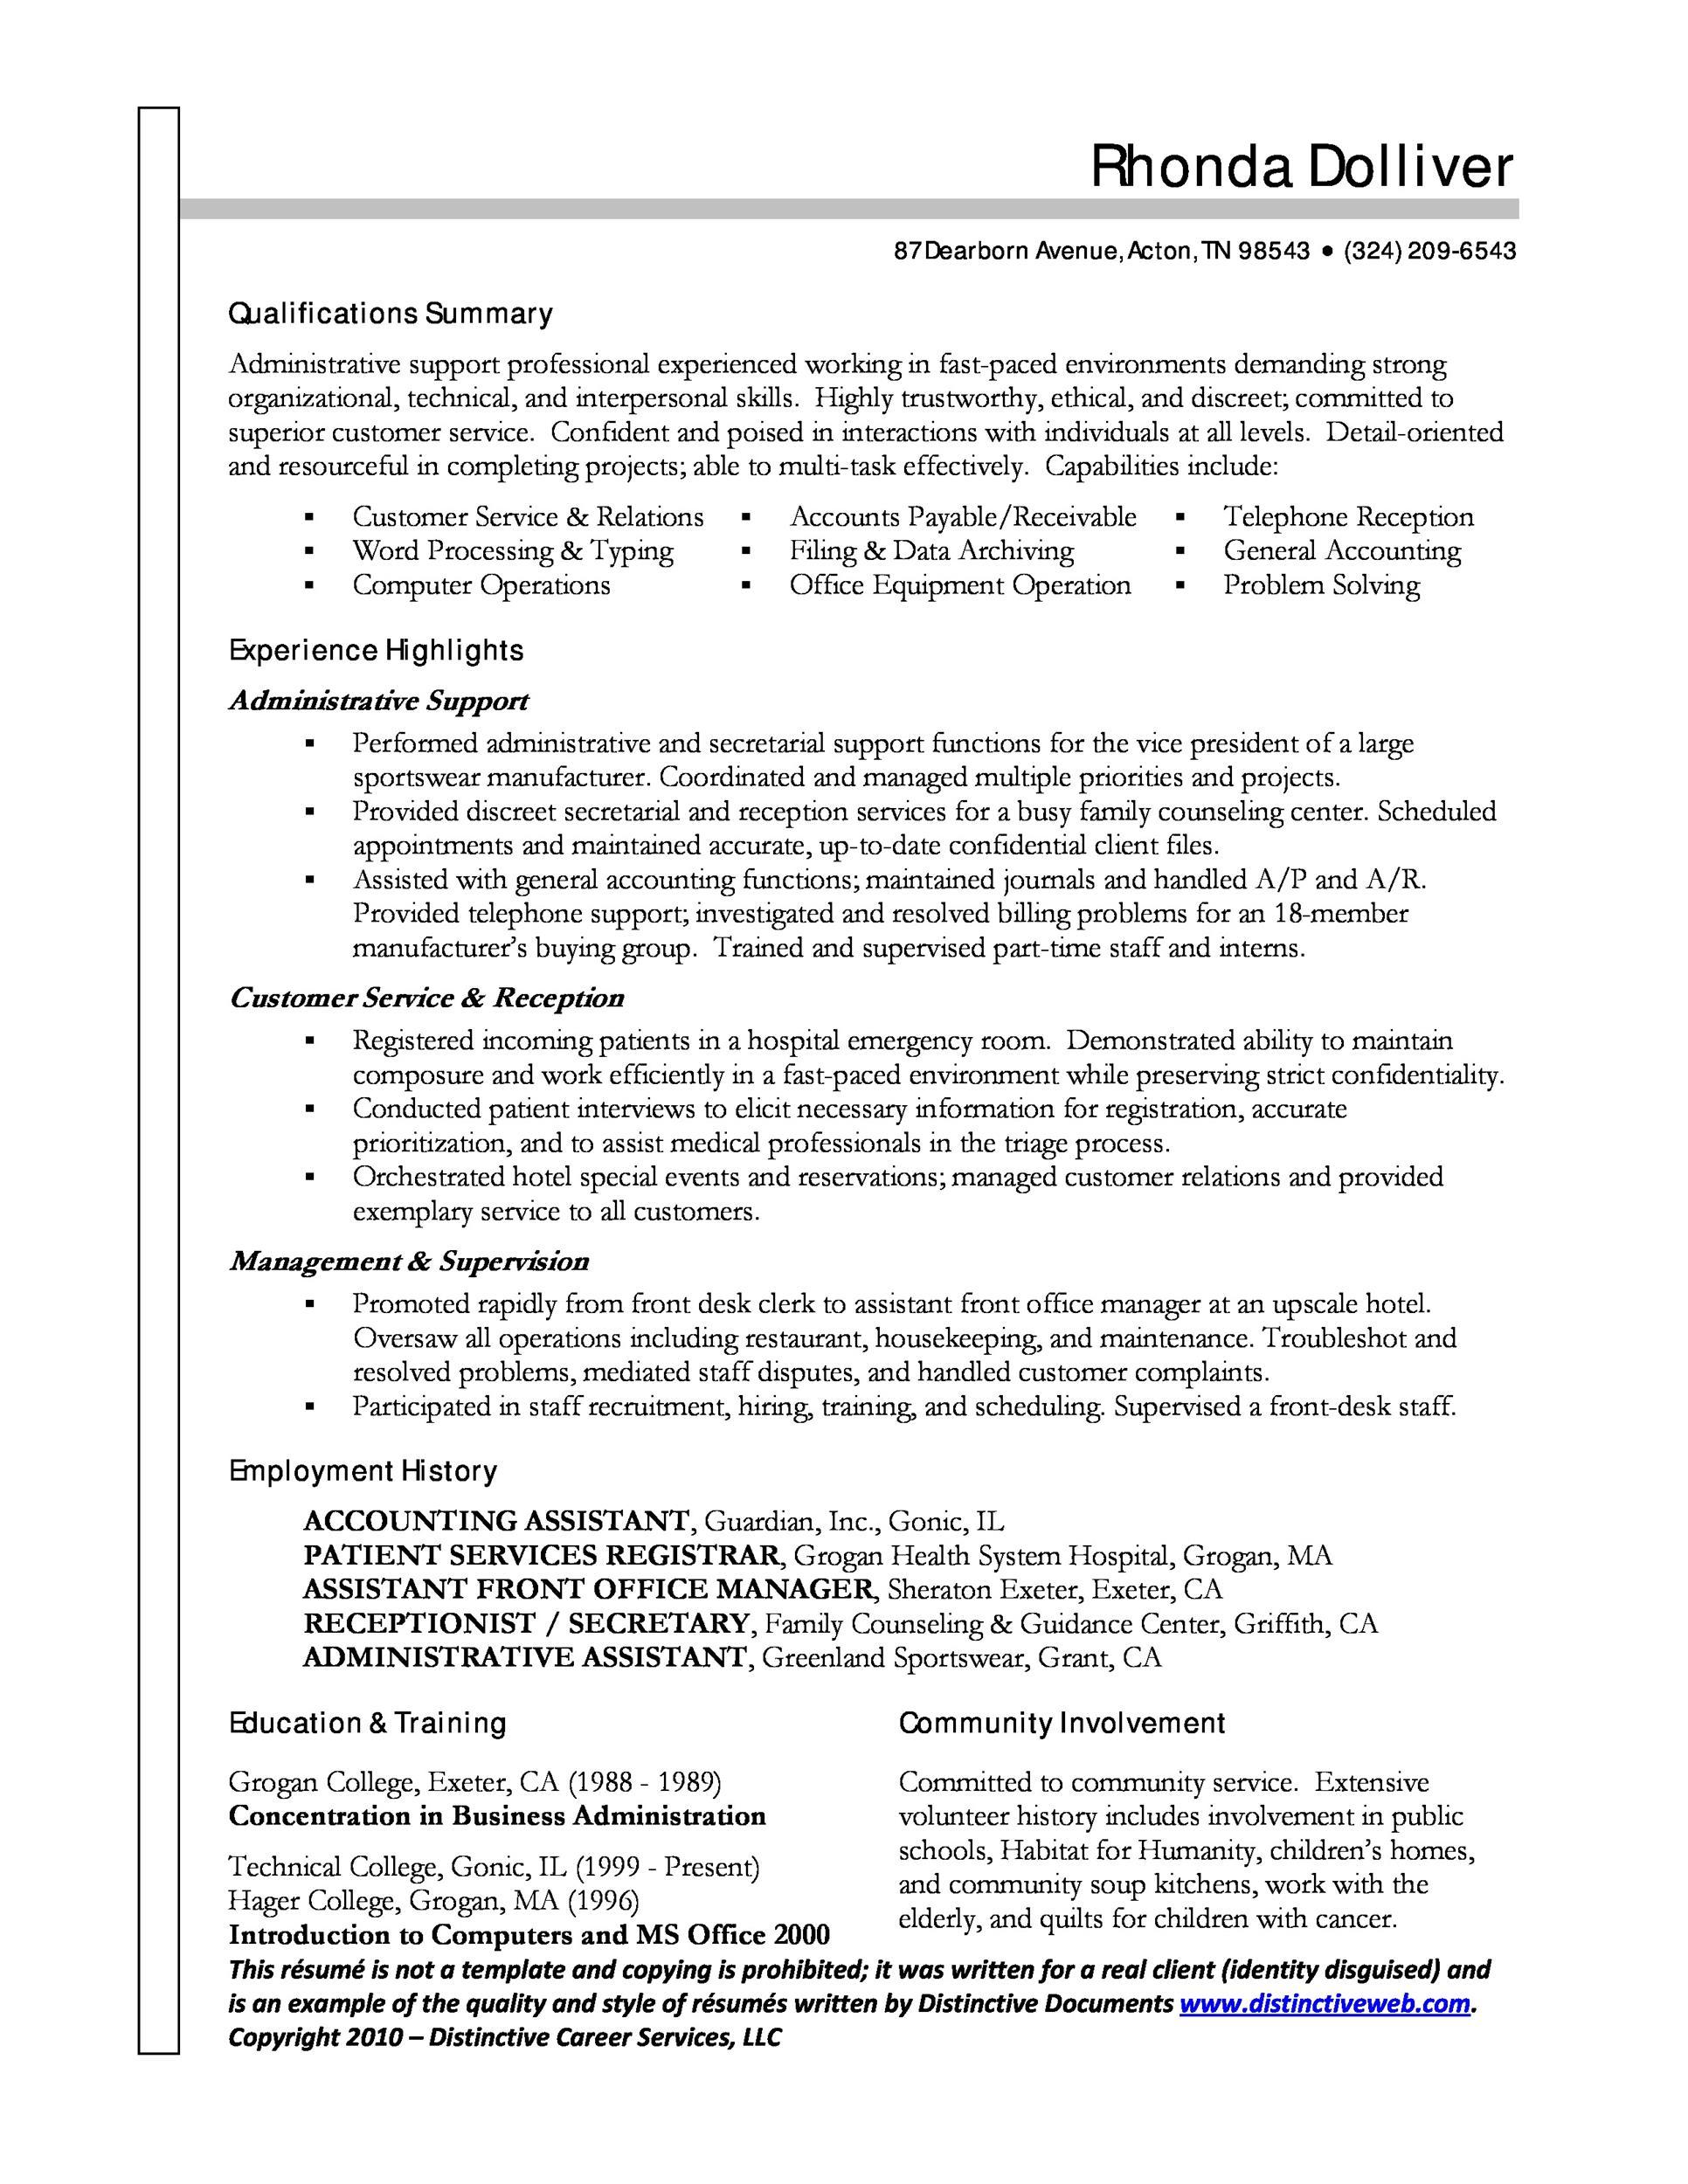 nursing secretary resume development essay history international - admin assistant resume